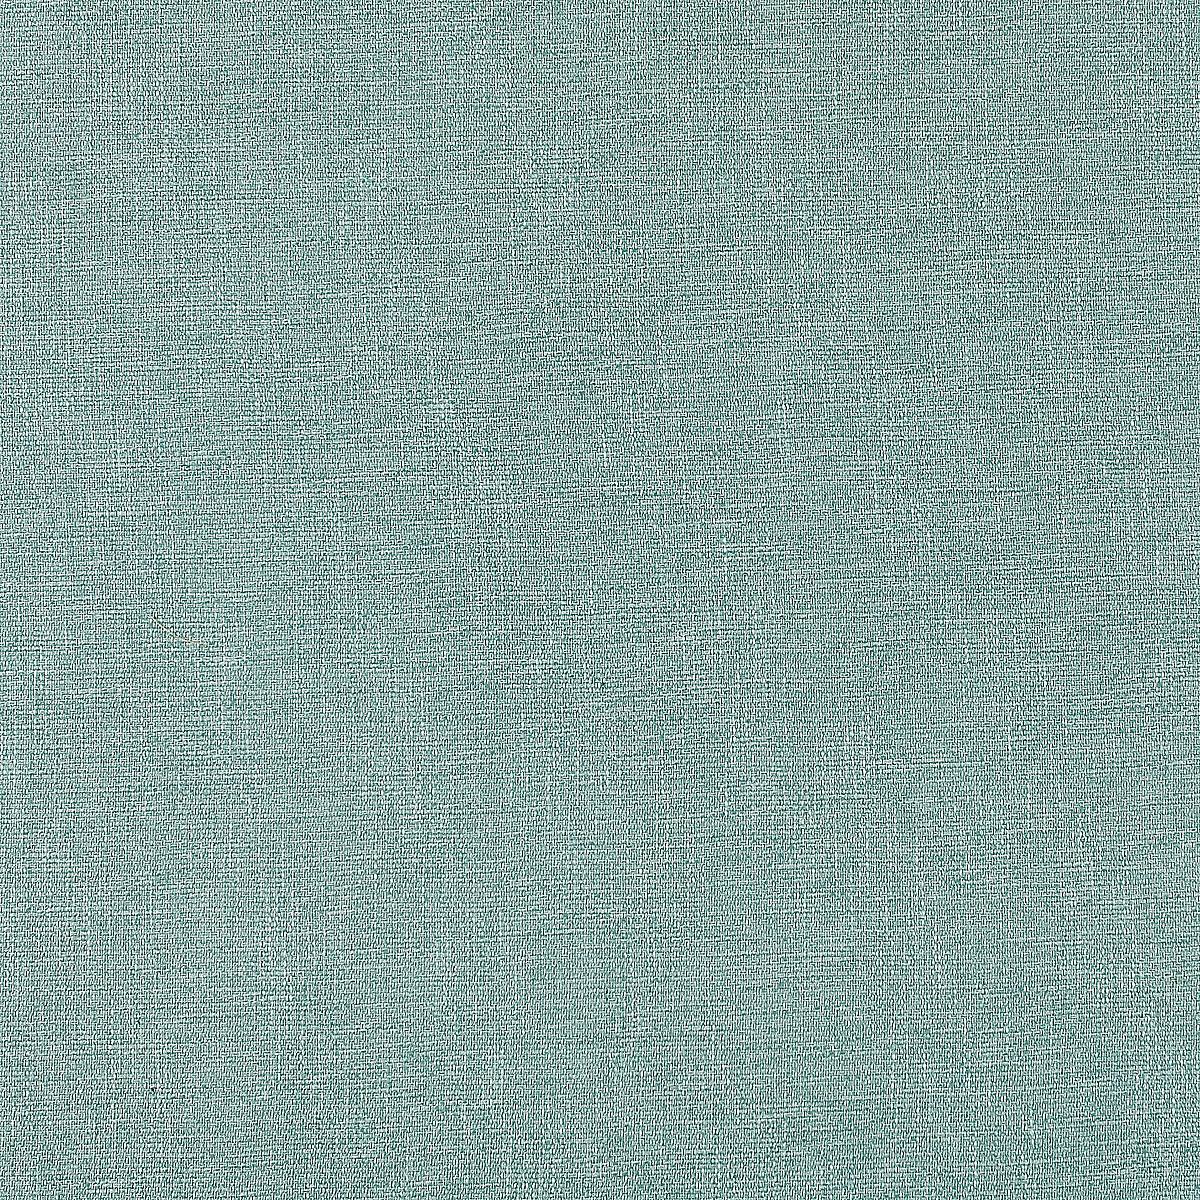 Suit-Up: Porch (fabric yardage)